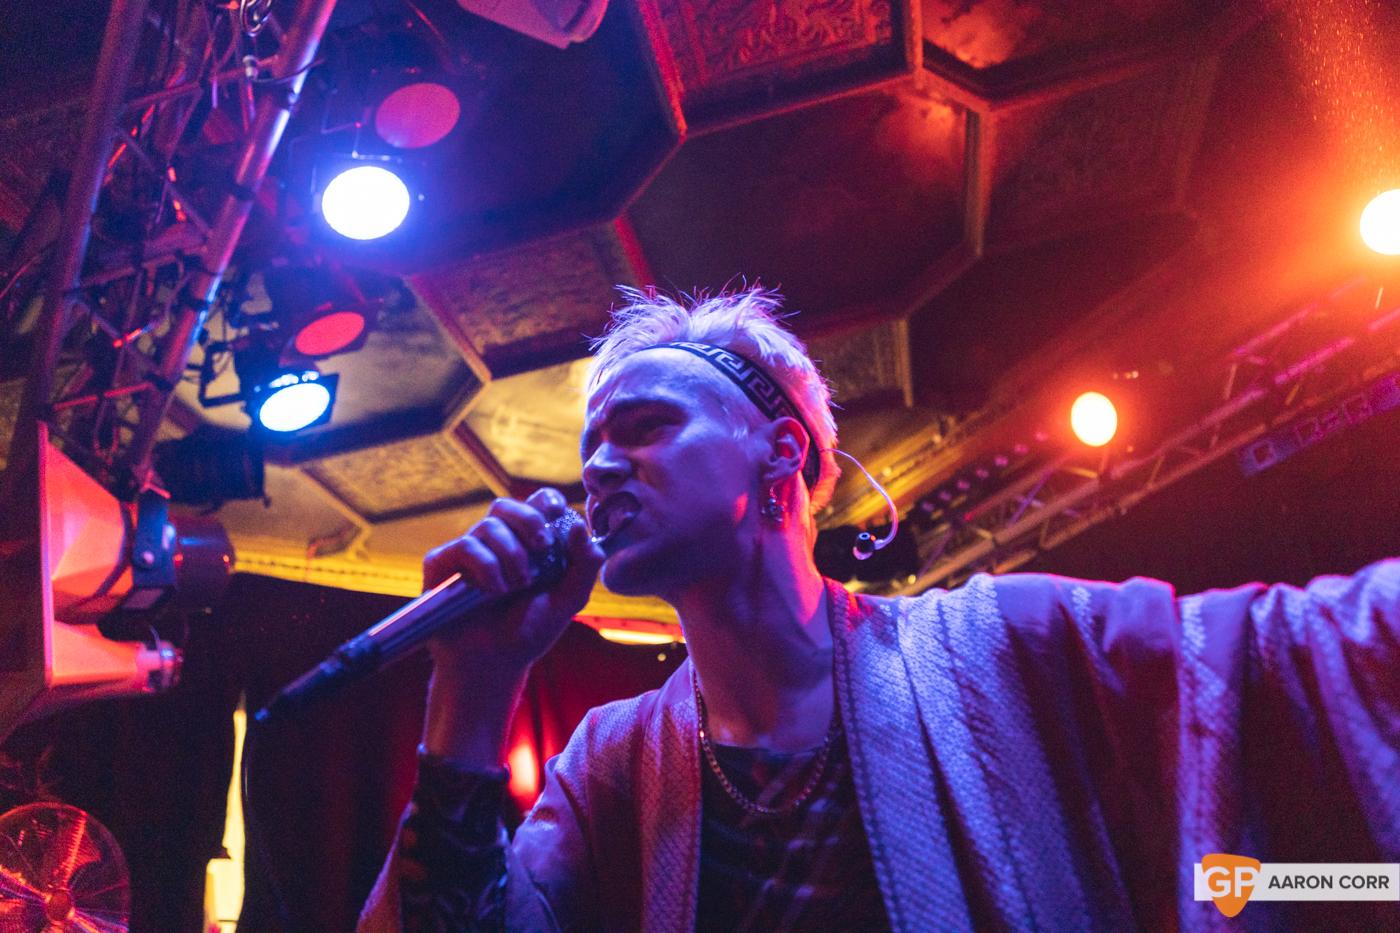 HMLTD live at The Sound House, Dublin on 17-Feb-20 by Aaron Corr-2175